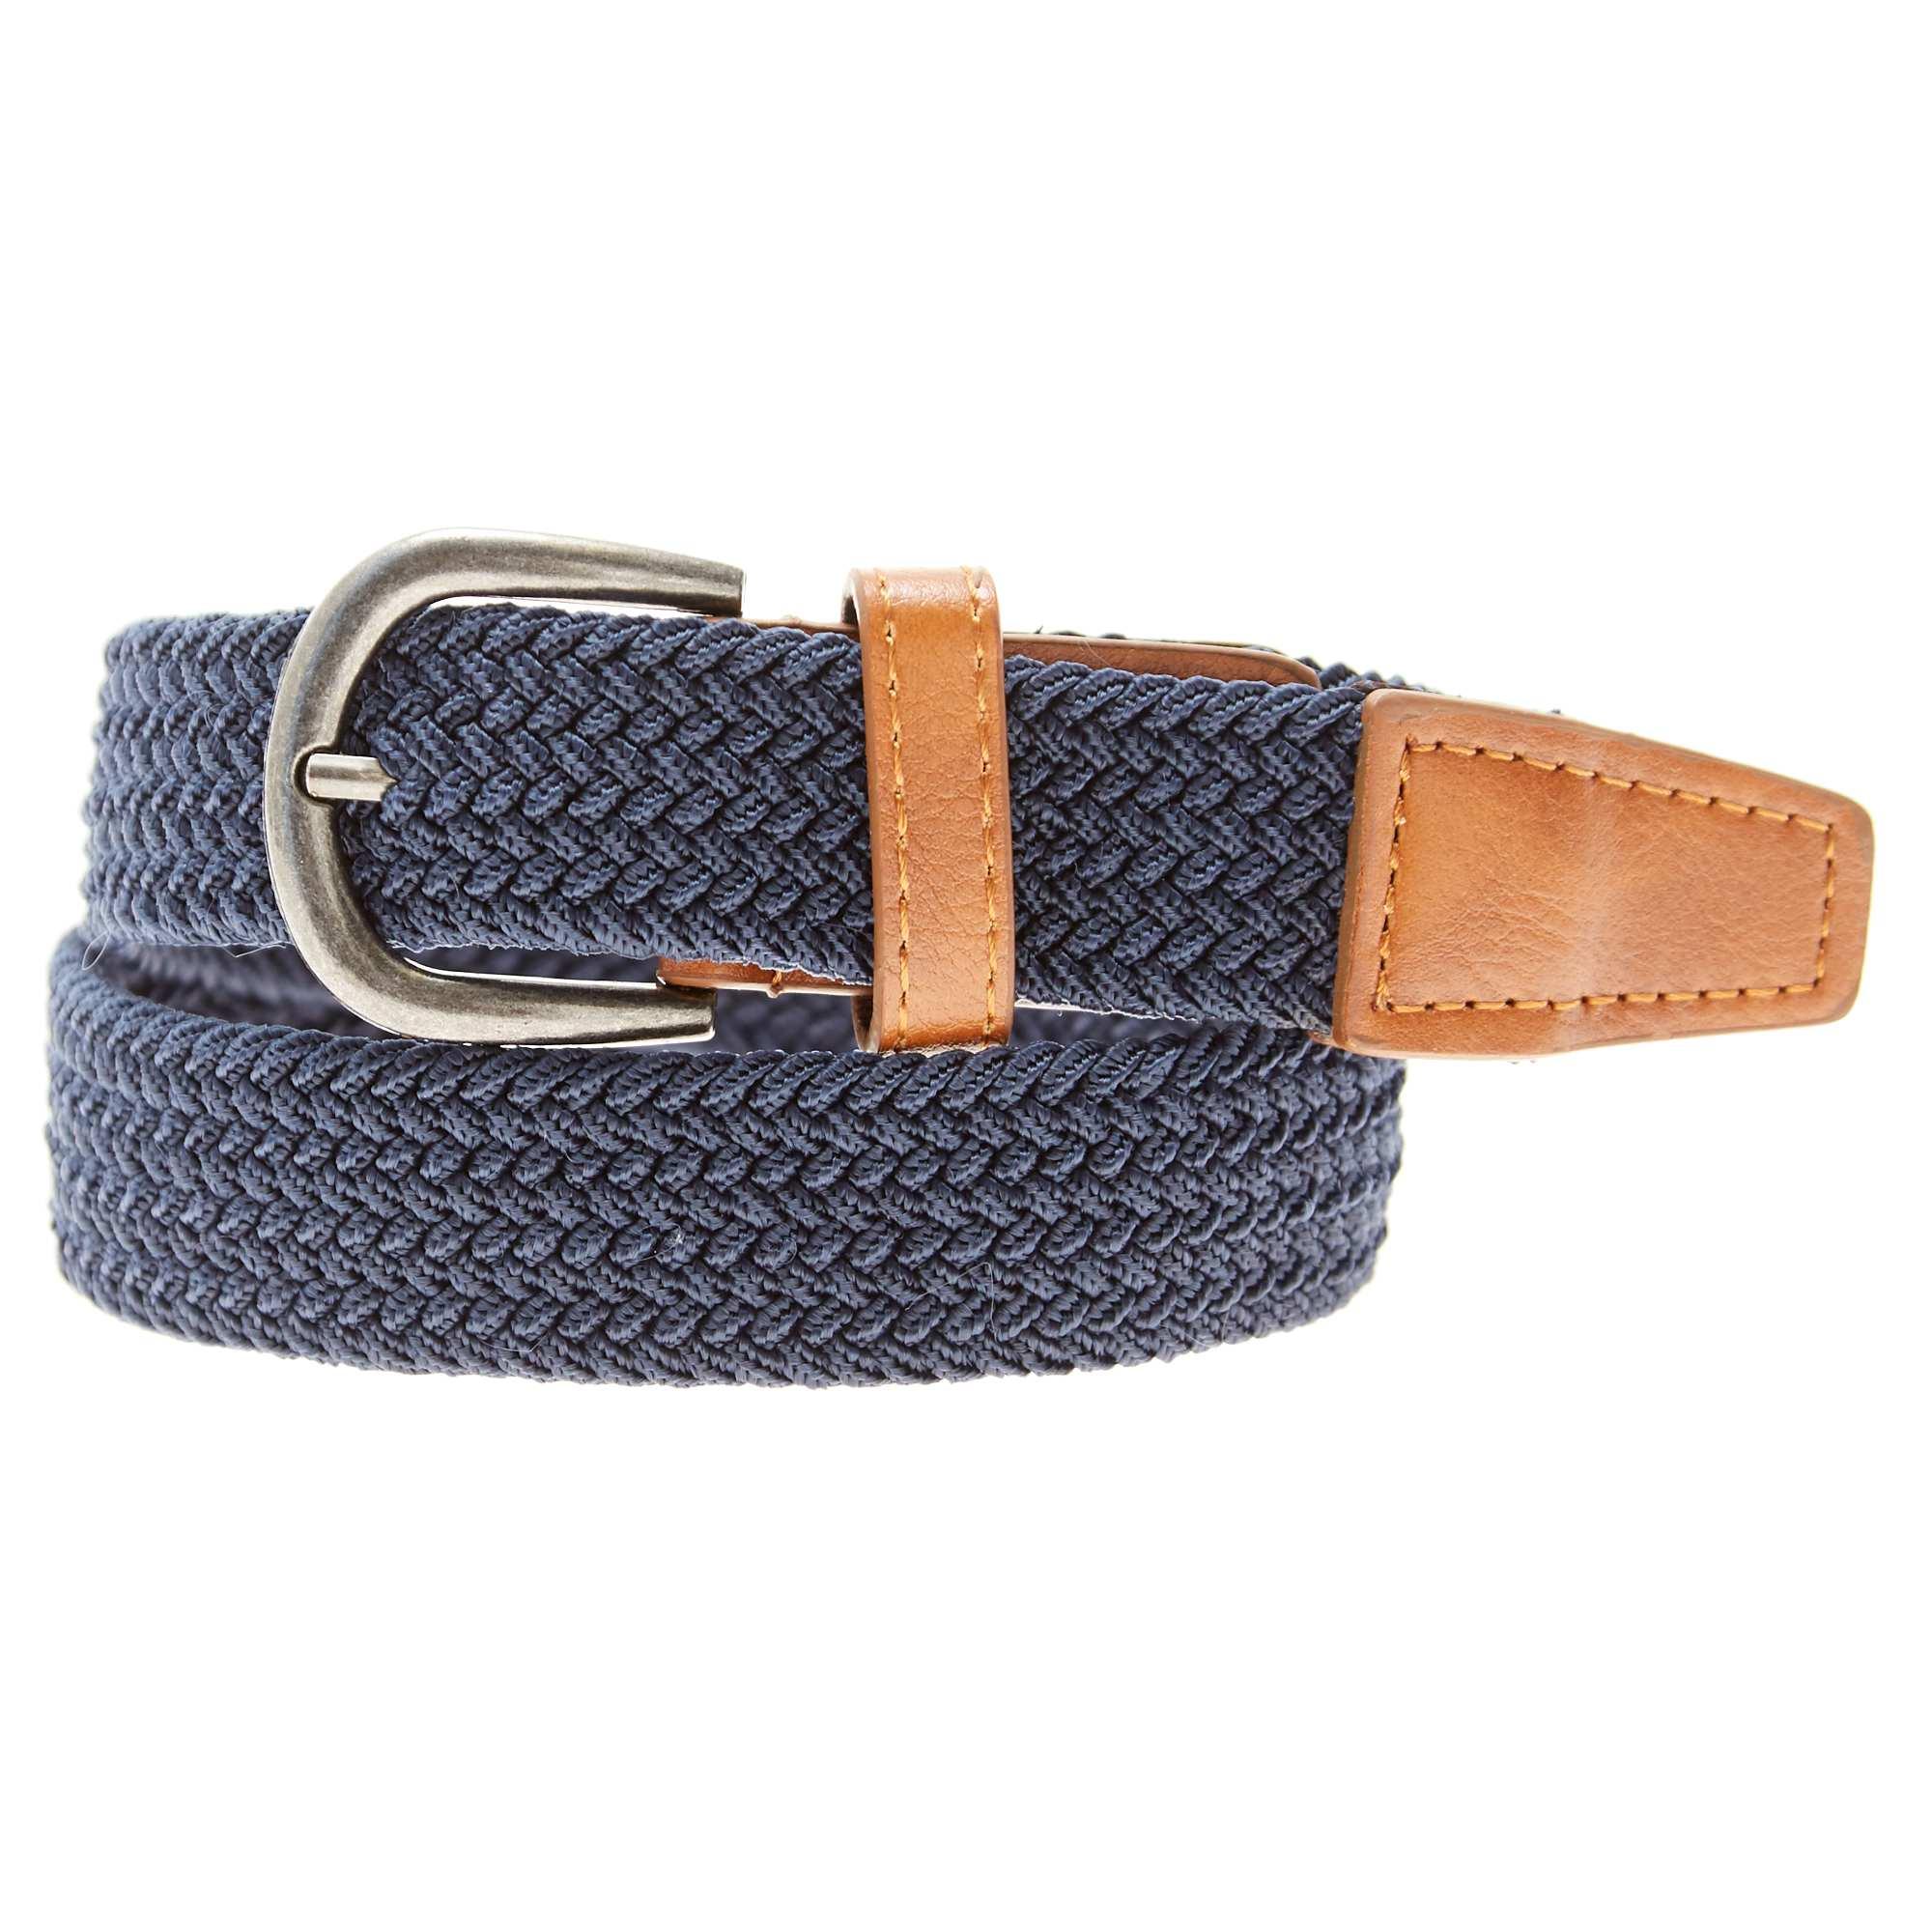 d6f33cbabfe9e Fine ceinture tressée Garçon - bleu marine - Kiabi - 5,00€